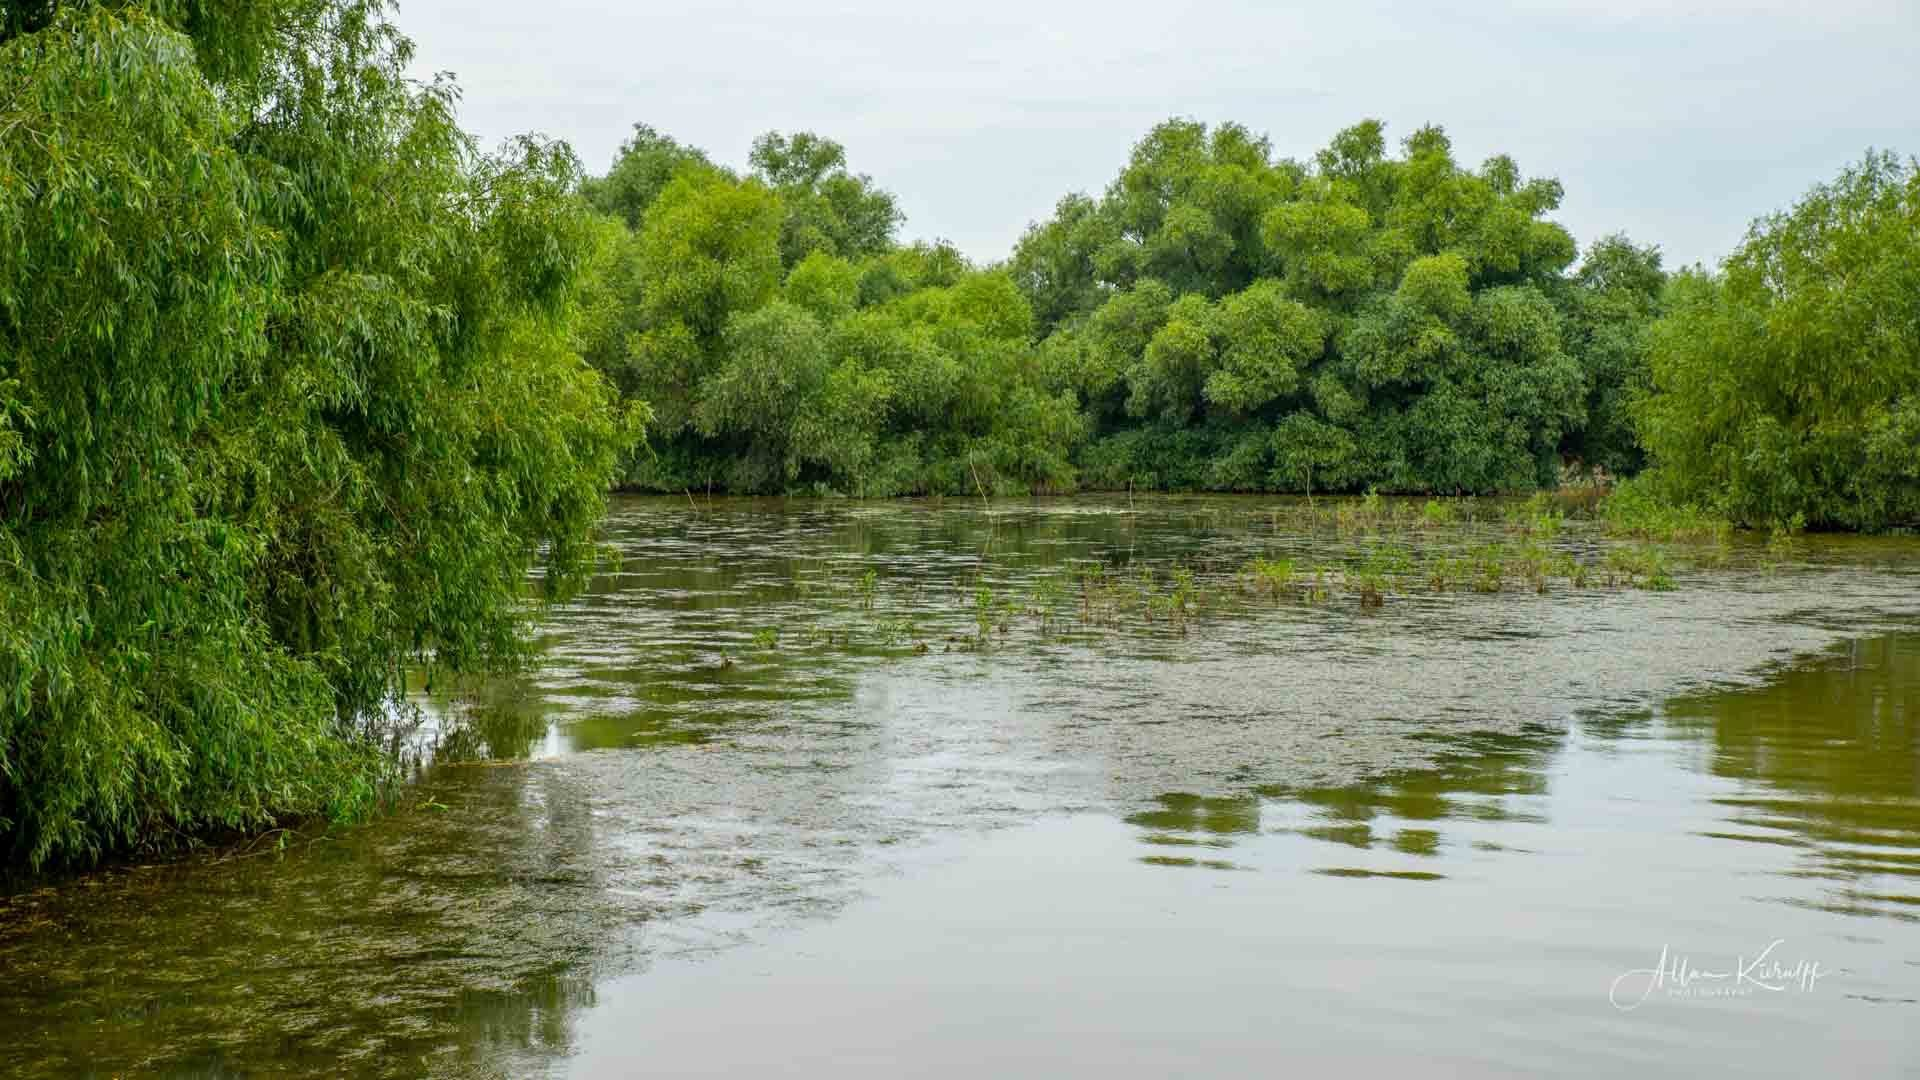 Donau Deltaet 42